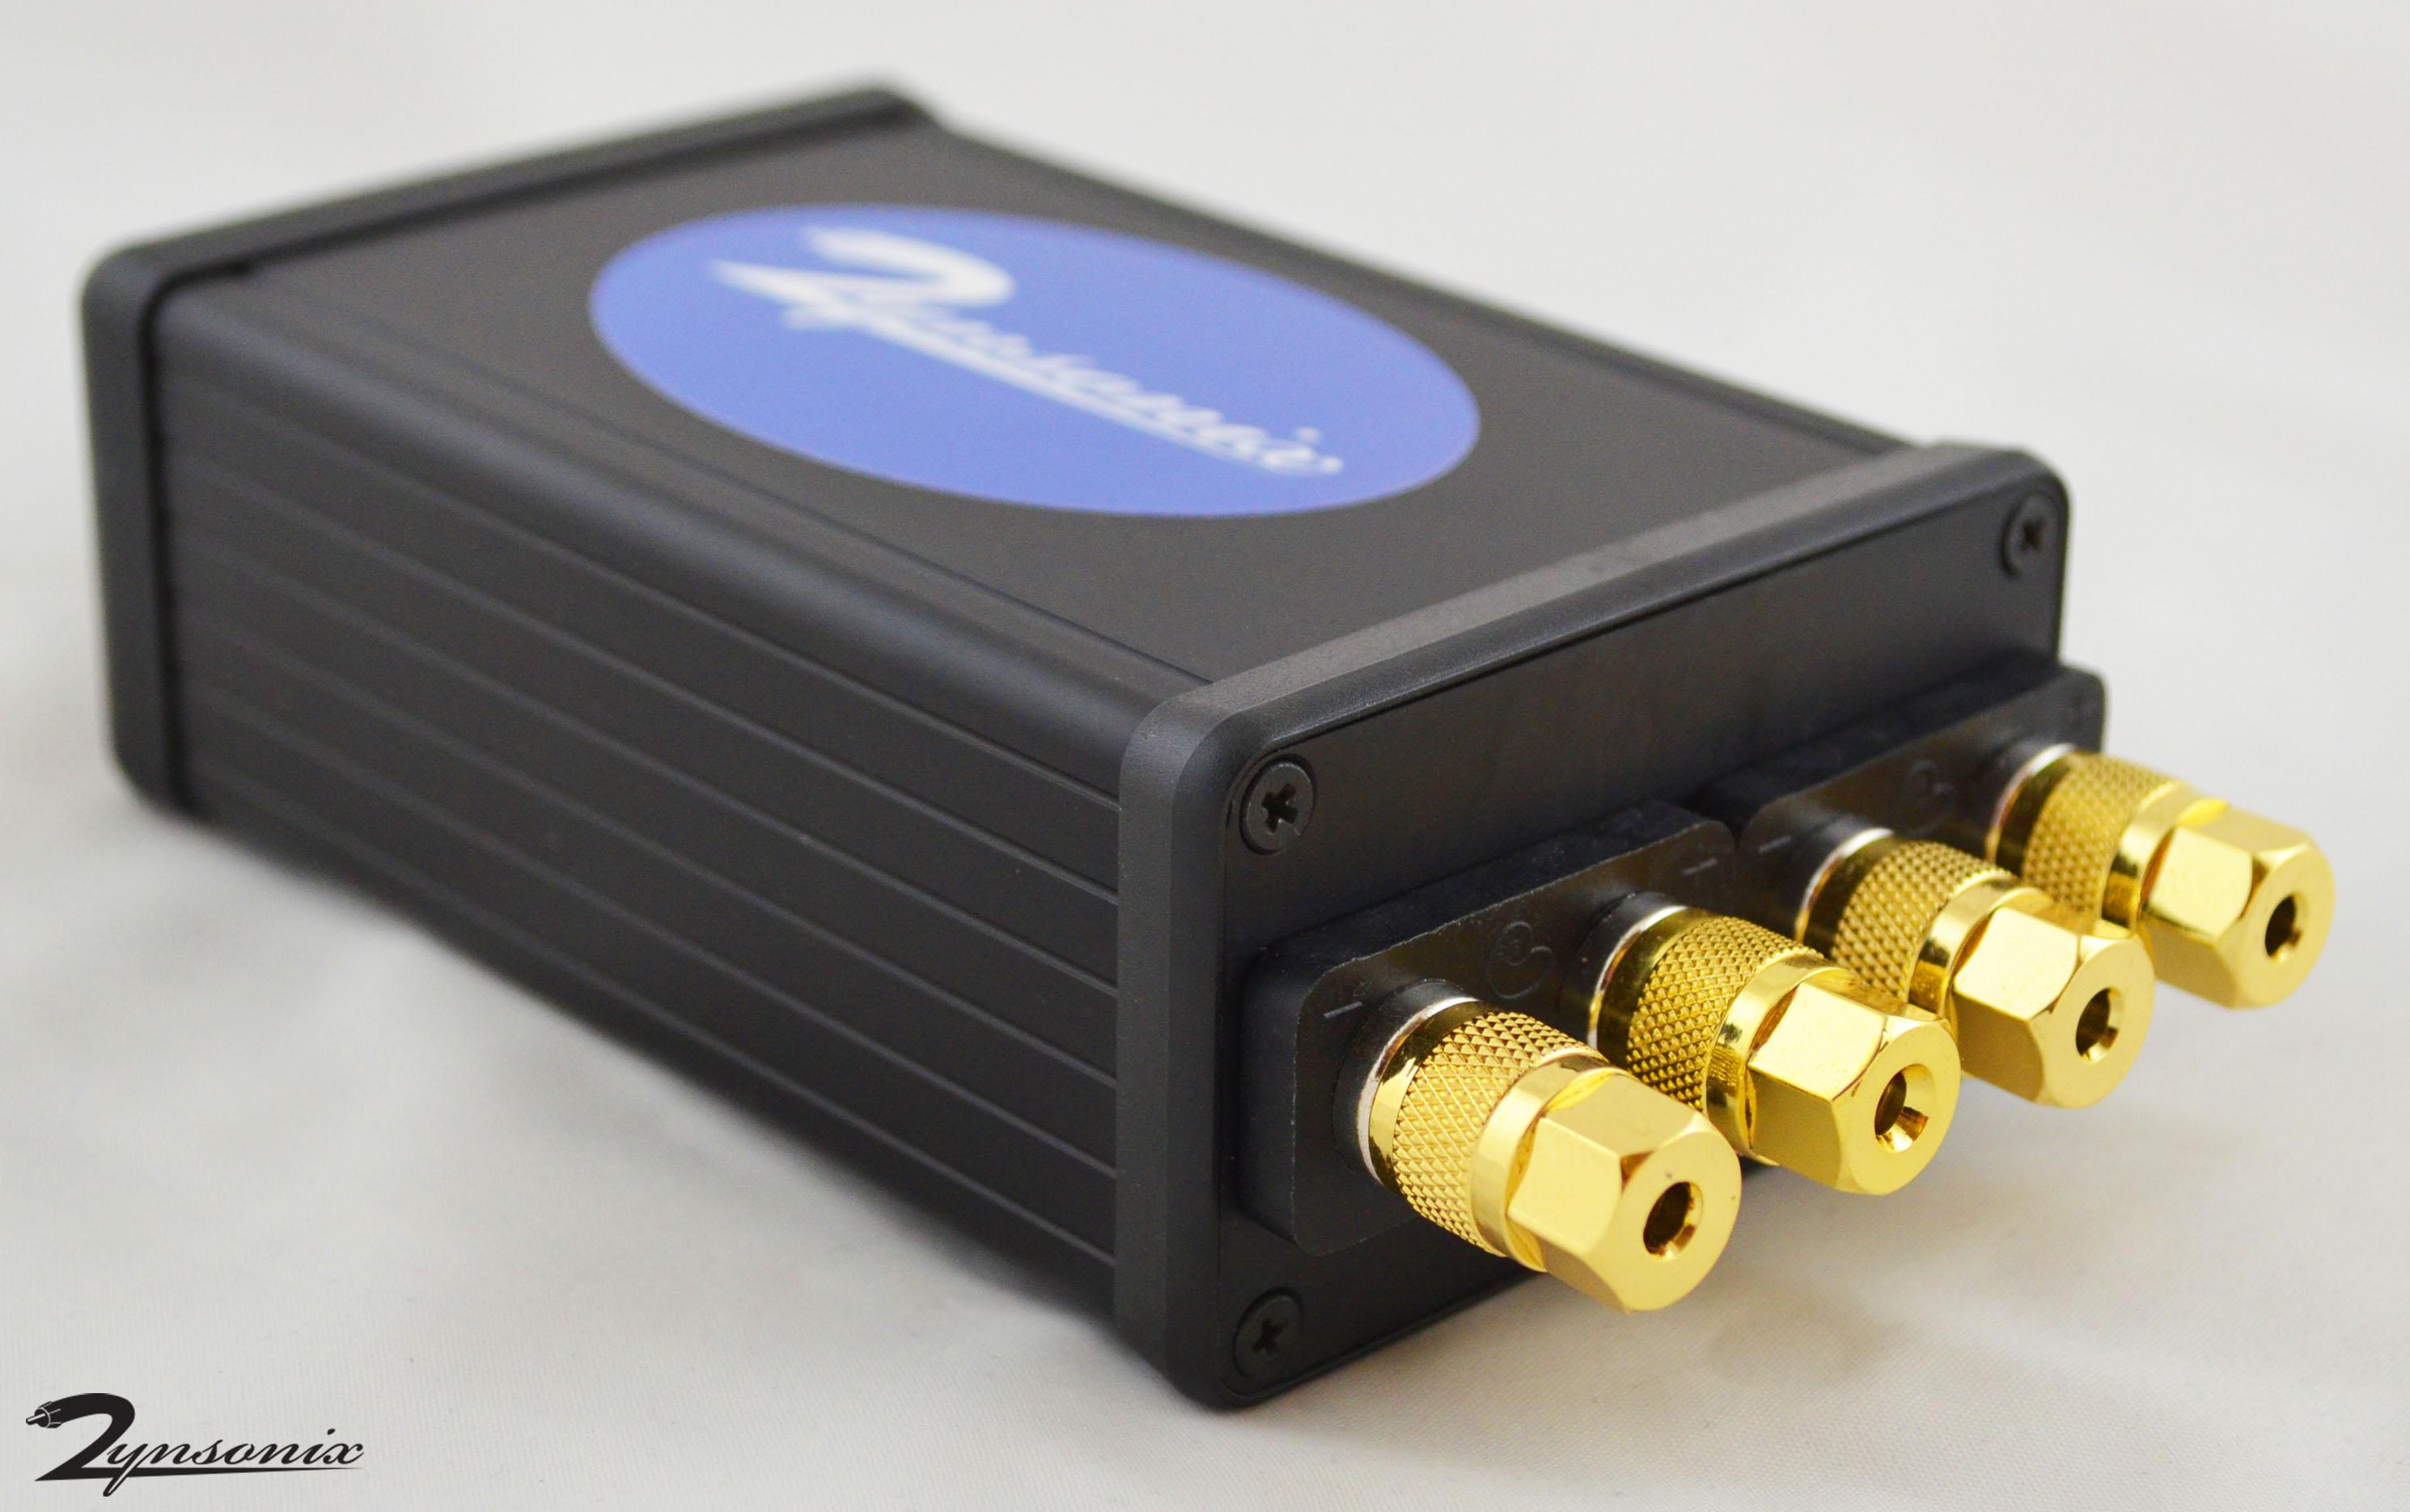 Speaker Amp To Headphone Adapter Box Listen To